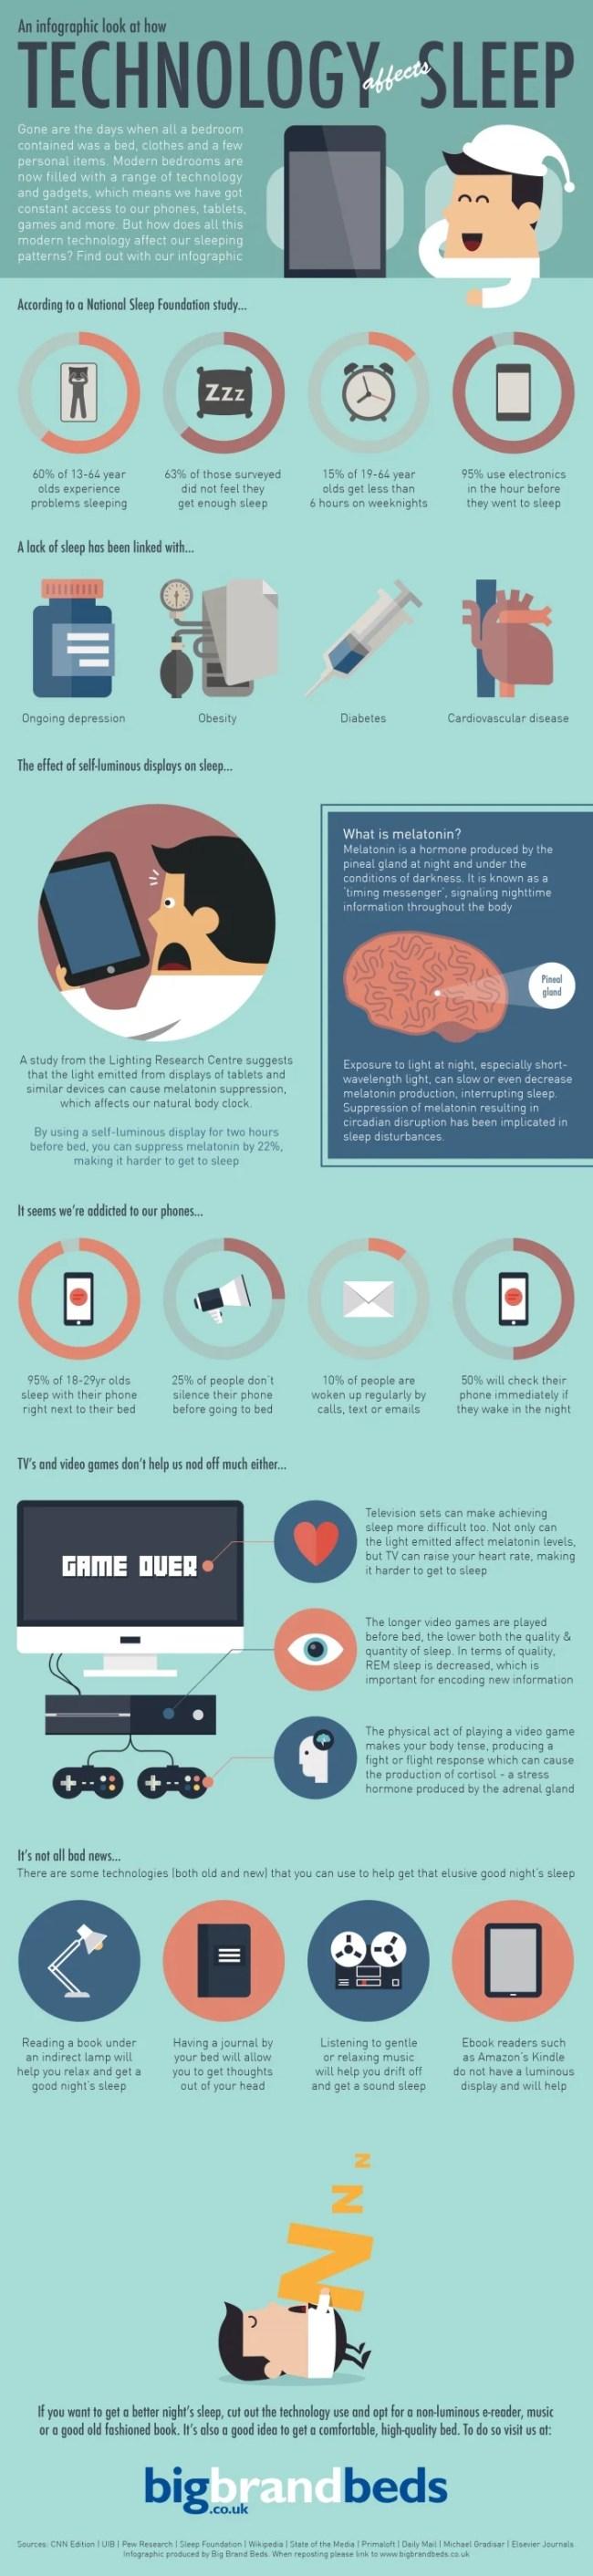 how-technology-affects-sleep-sml-164246